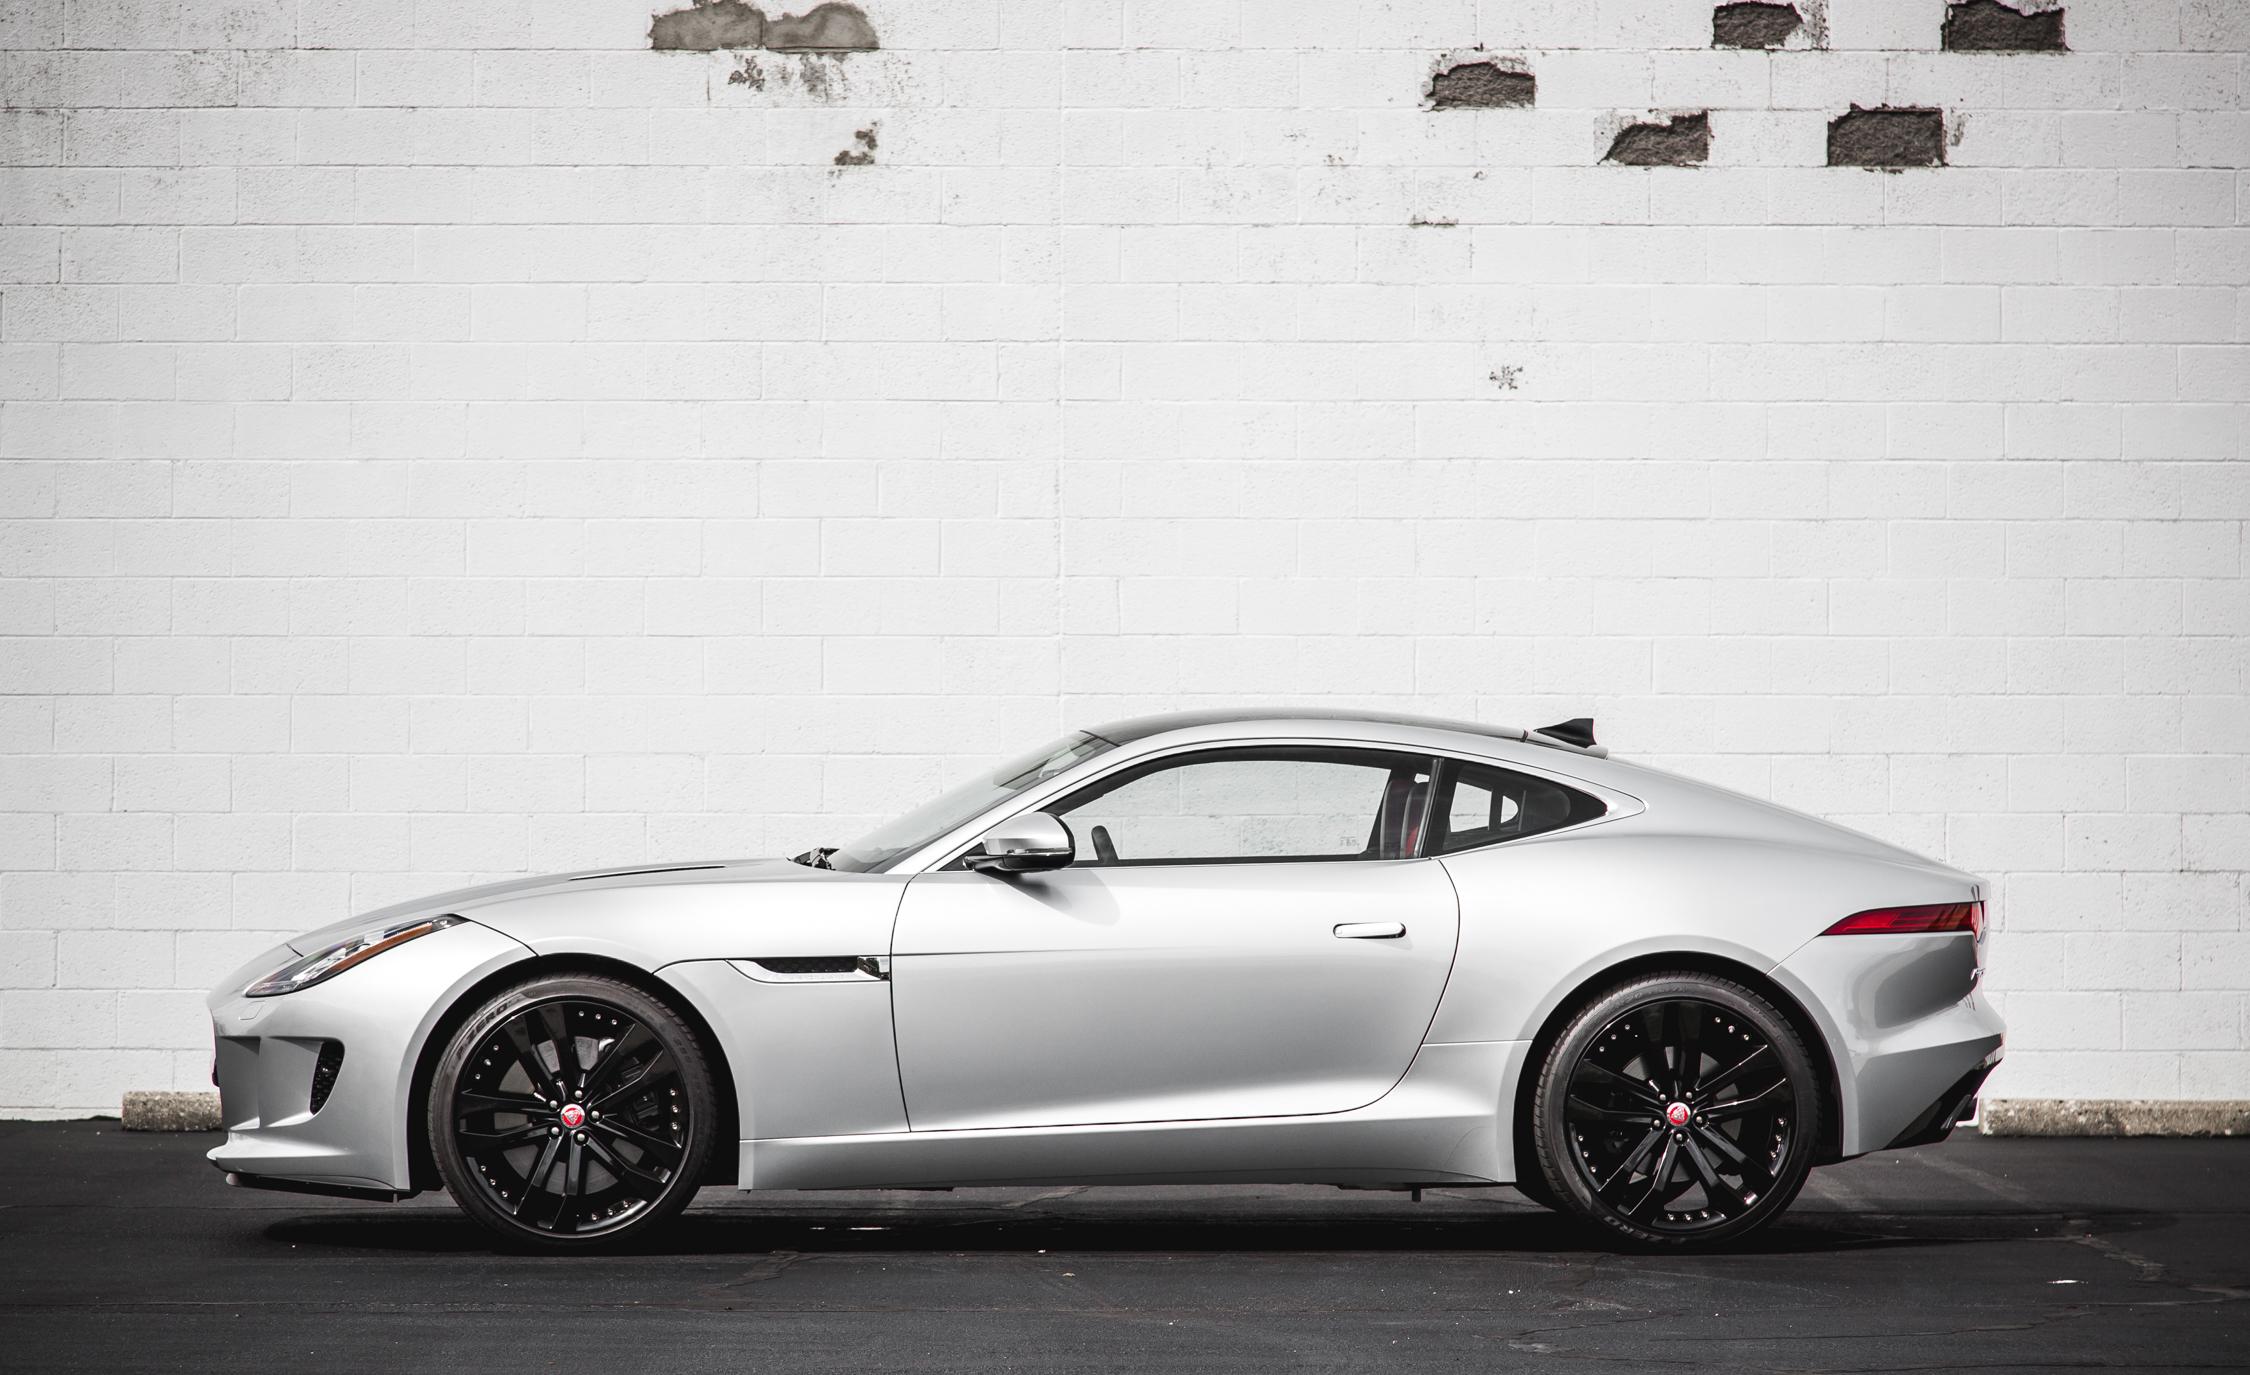 2016 Jaguar F-Type S Exterior Side